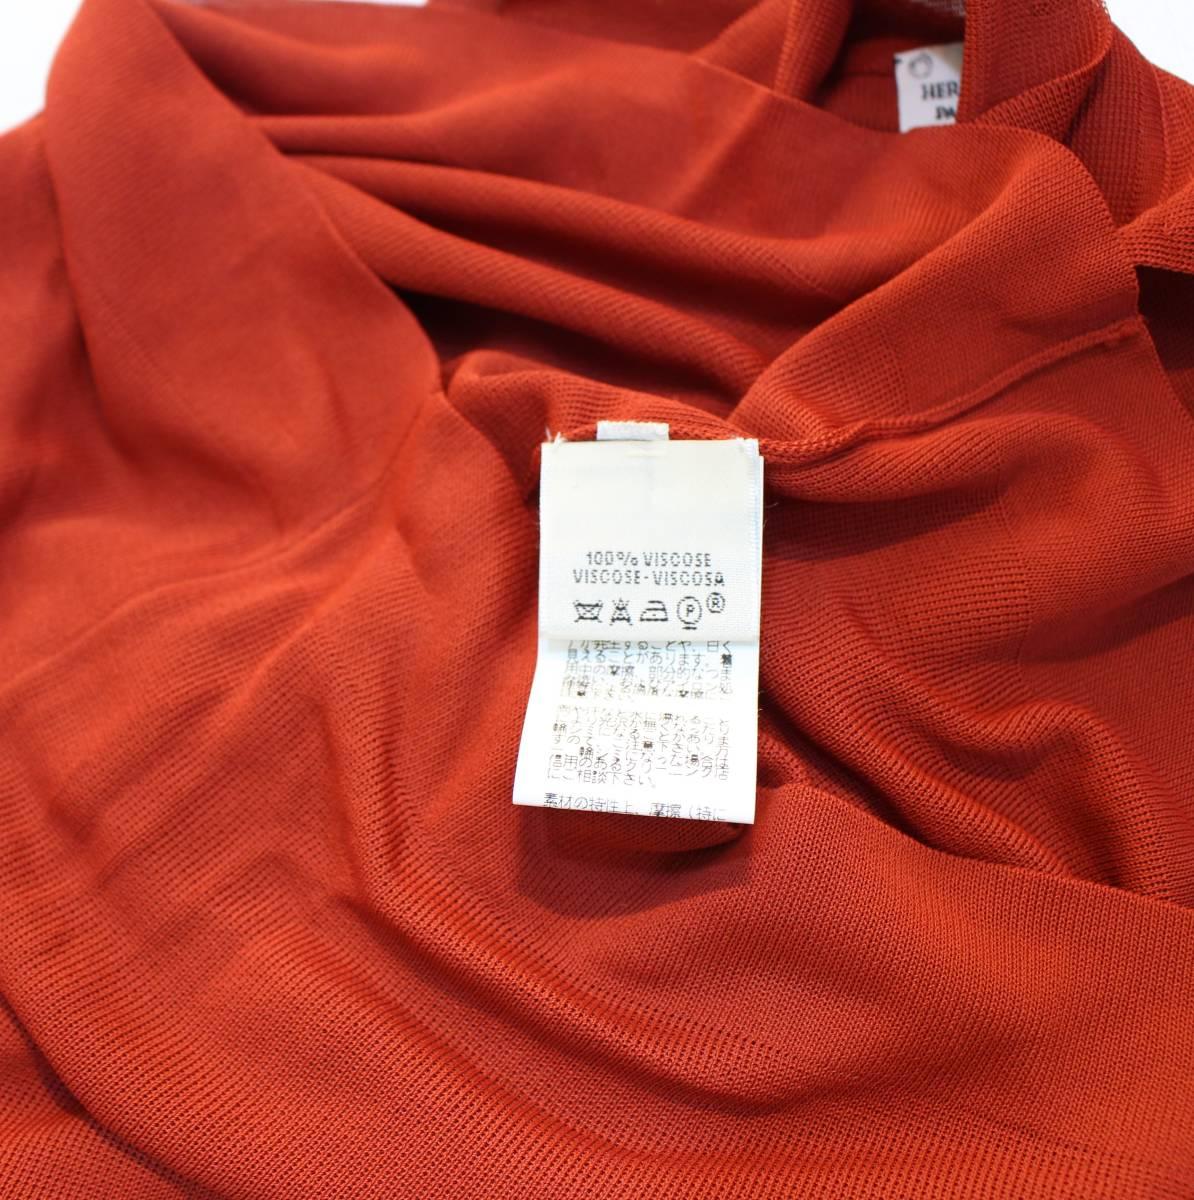 HERMES MADE BY Margiela AMERICAN SLEEVE SHIRT MADE IN ITALY/エルメスマルジェラ期アメリカンスリーブシャツ_画像6